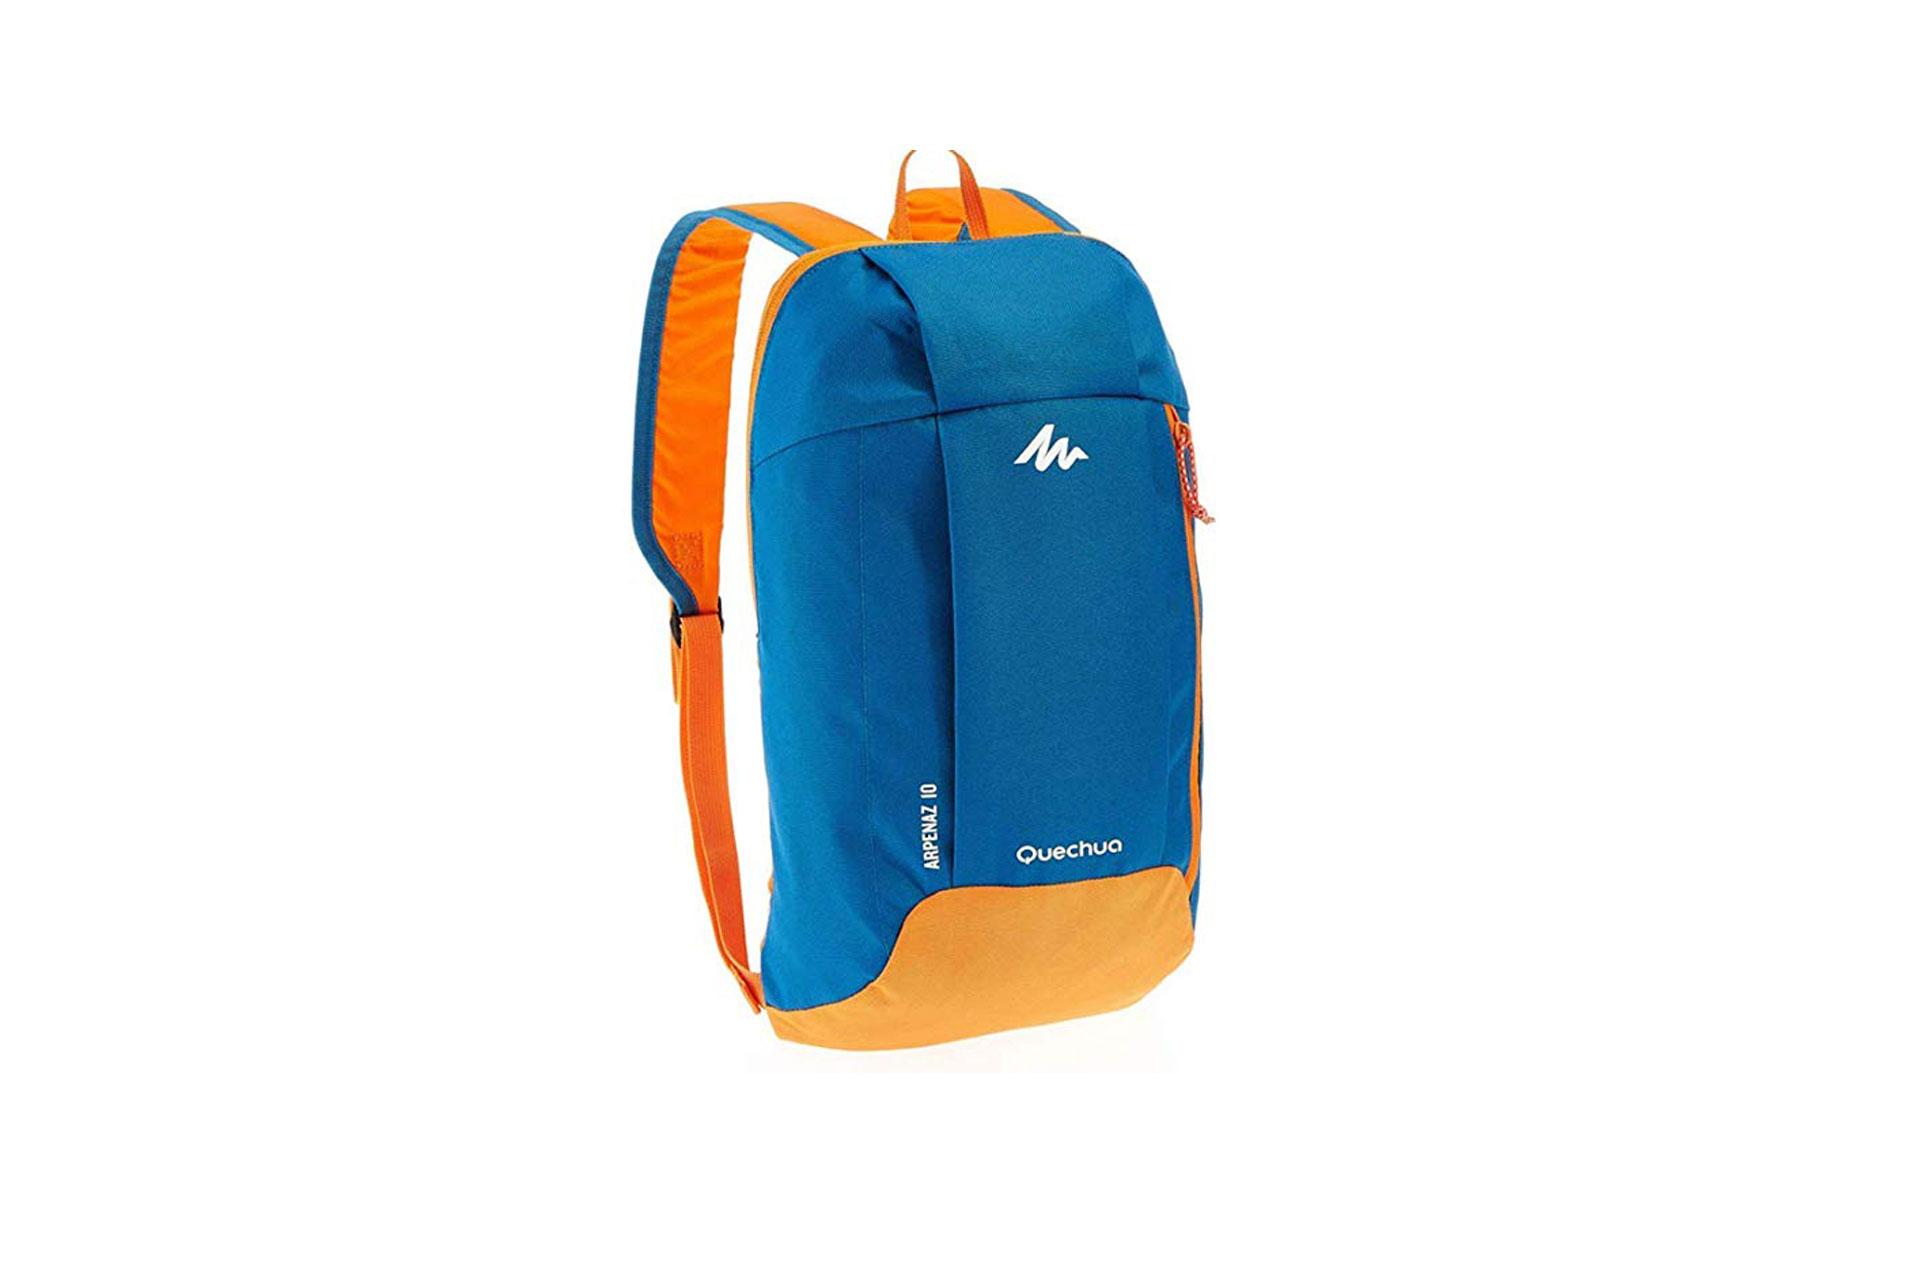 Daybag Backpack; Courtesy of Amazon